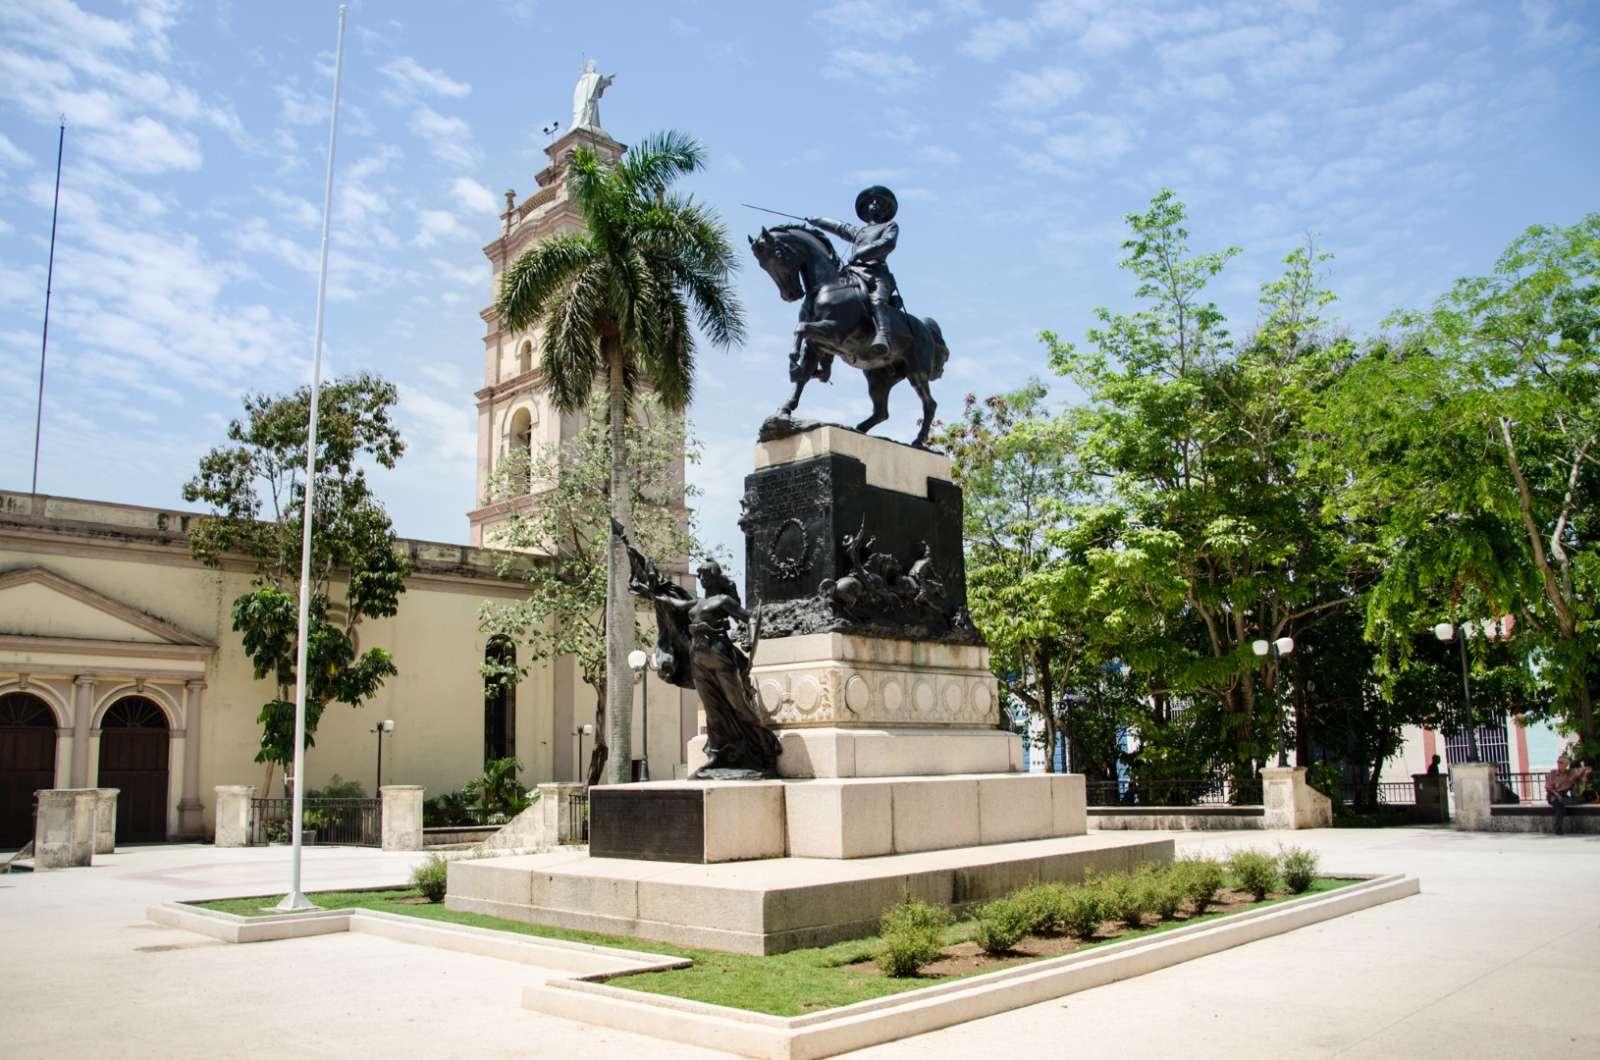 Statue in Camaguey square, Cuba